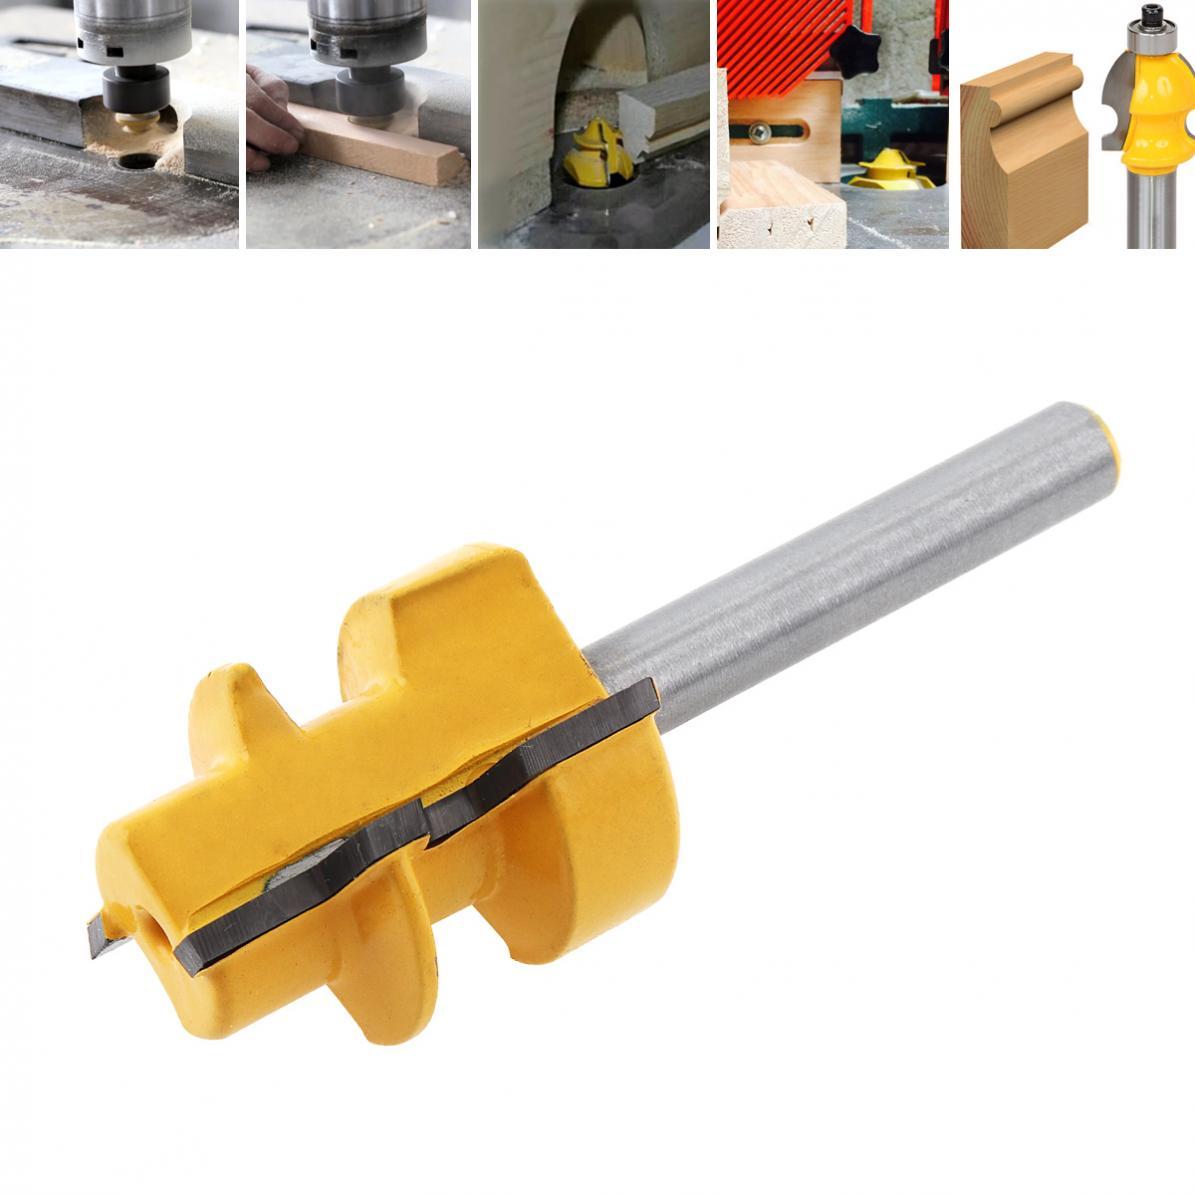 Milling Cutter 1 / 4 Shank Slant Angle Cutter Trimming Machine Cutter Head Boring Cutter Angle Cutter